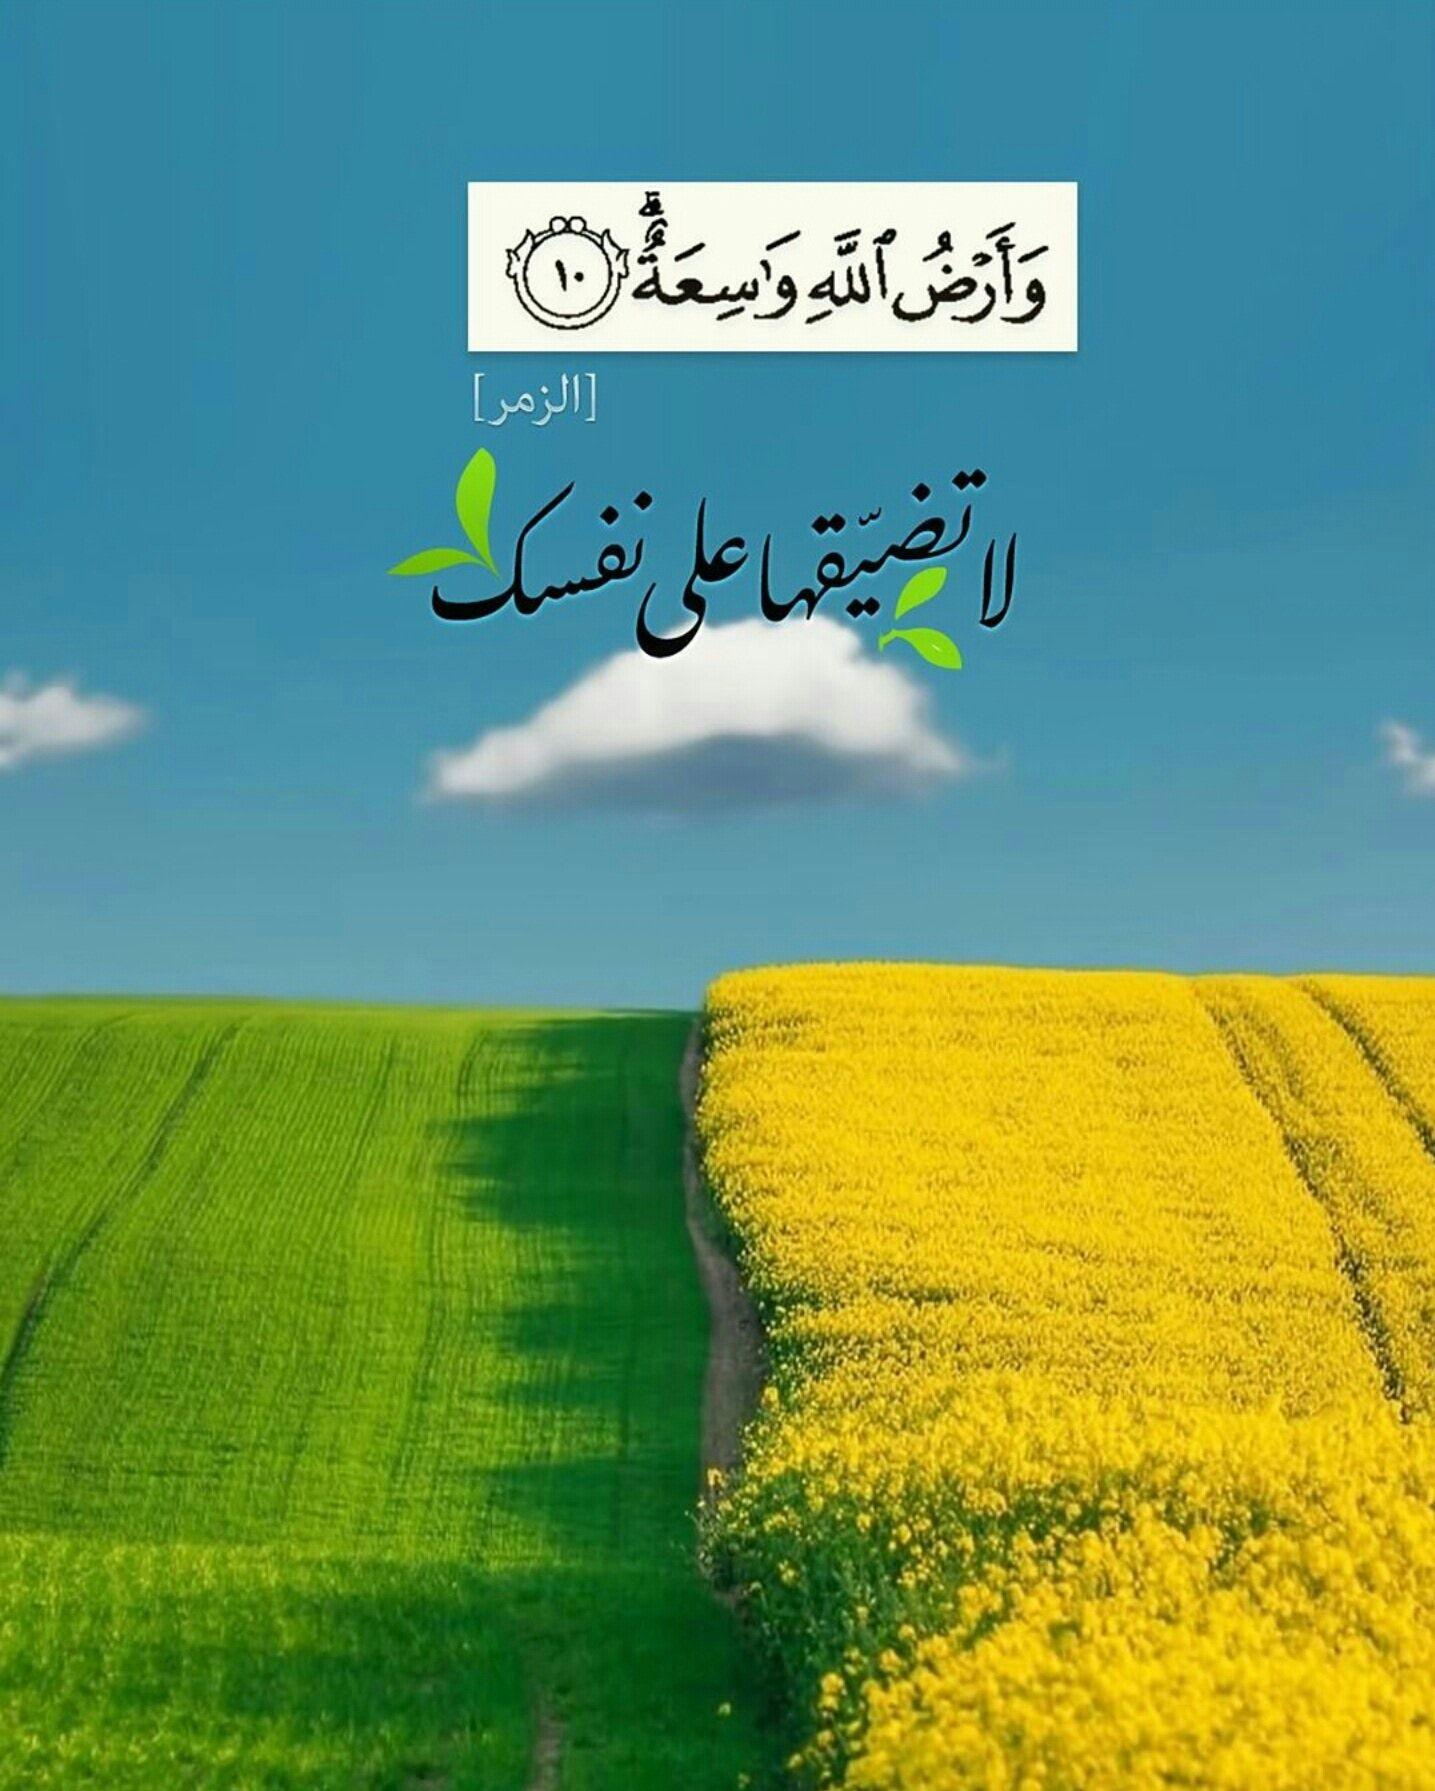 Pin By صورة و كلمة On مواعظ خواطر إسلامية Islamic Messages Islamic Quotes Poster